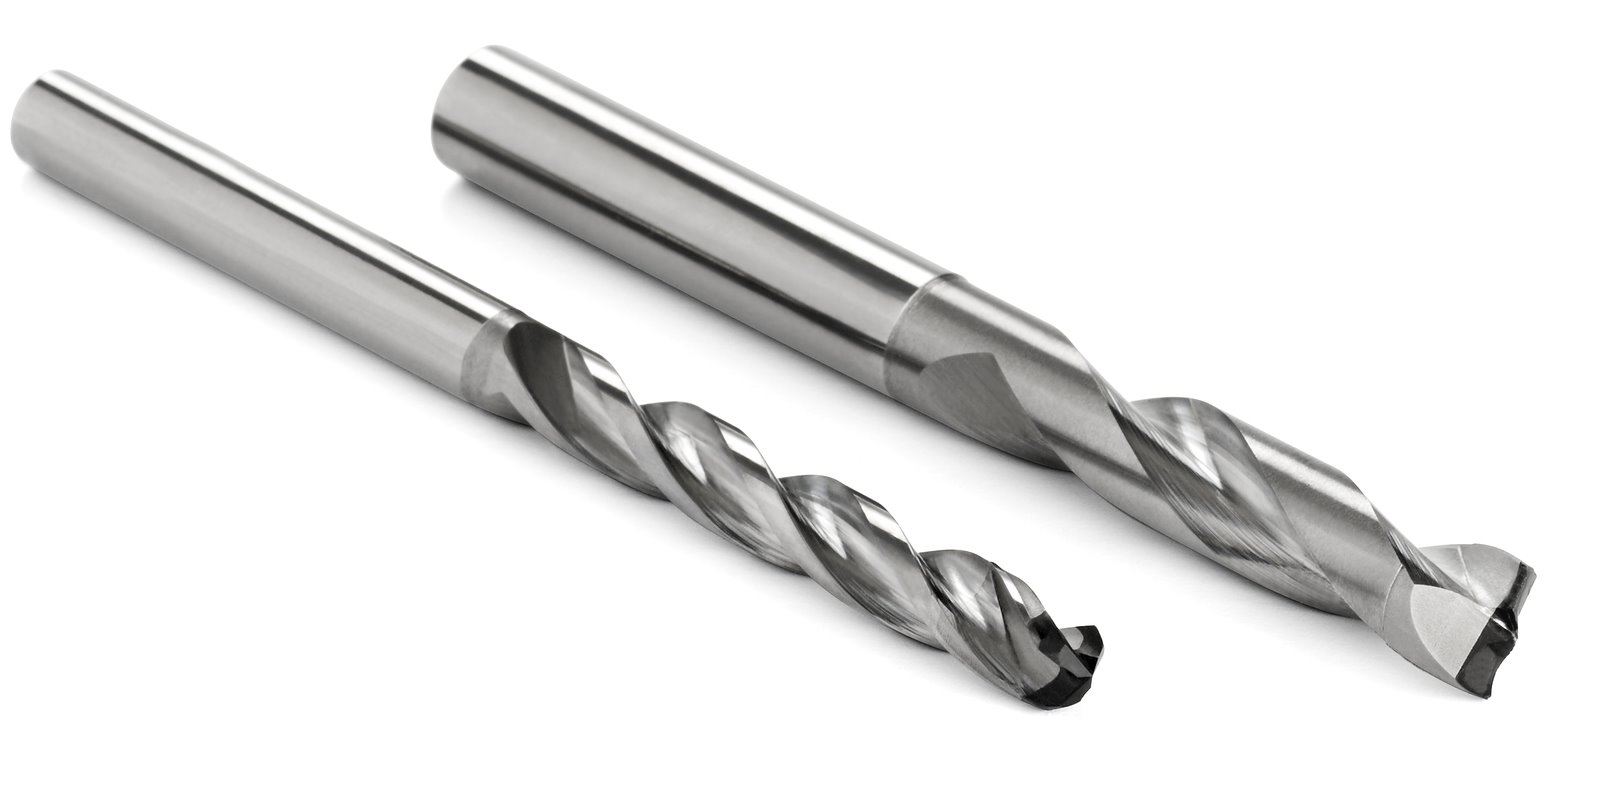 Group Solid drills PCD drill SD203-CX1/SD203-CX2 Seco Feedmax